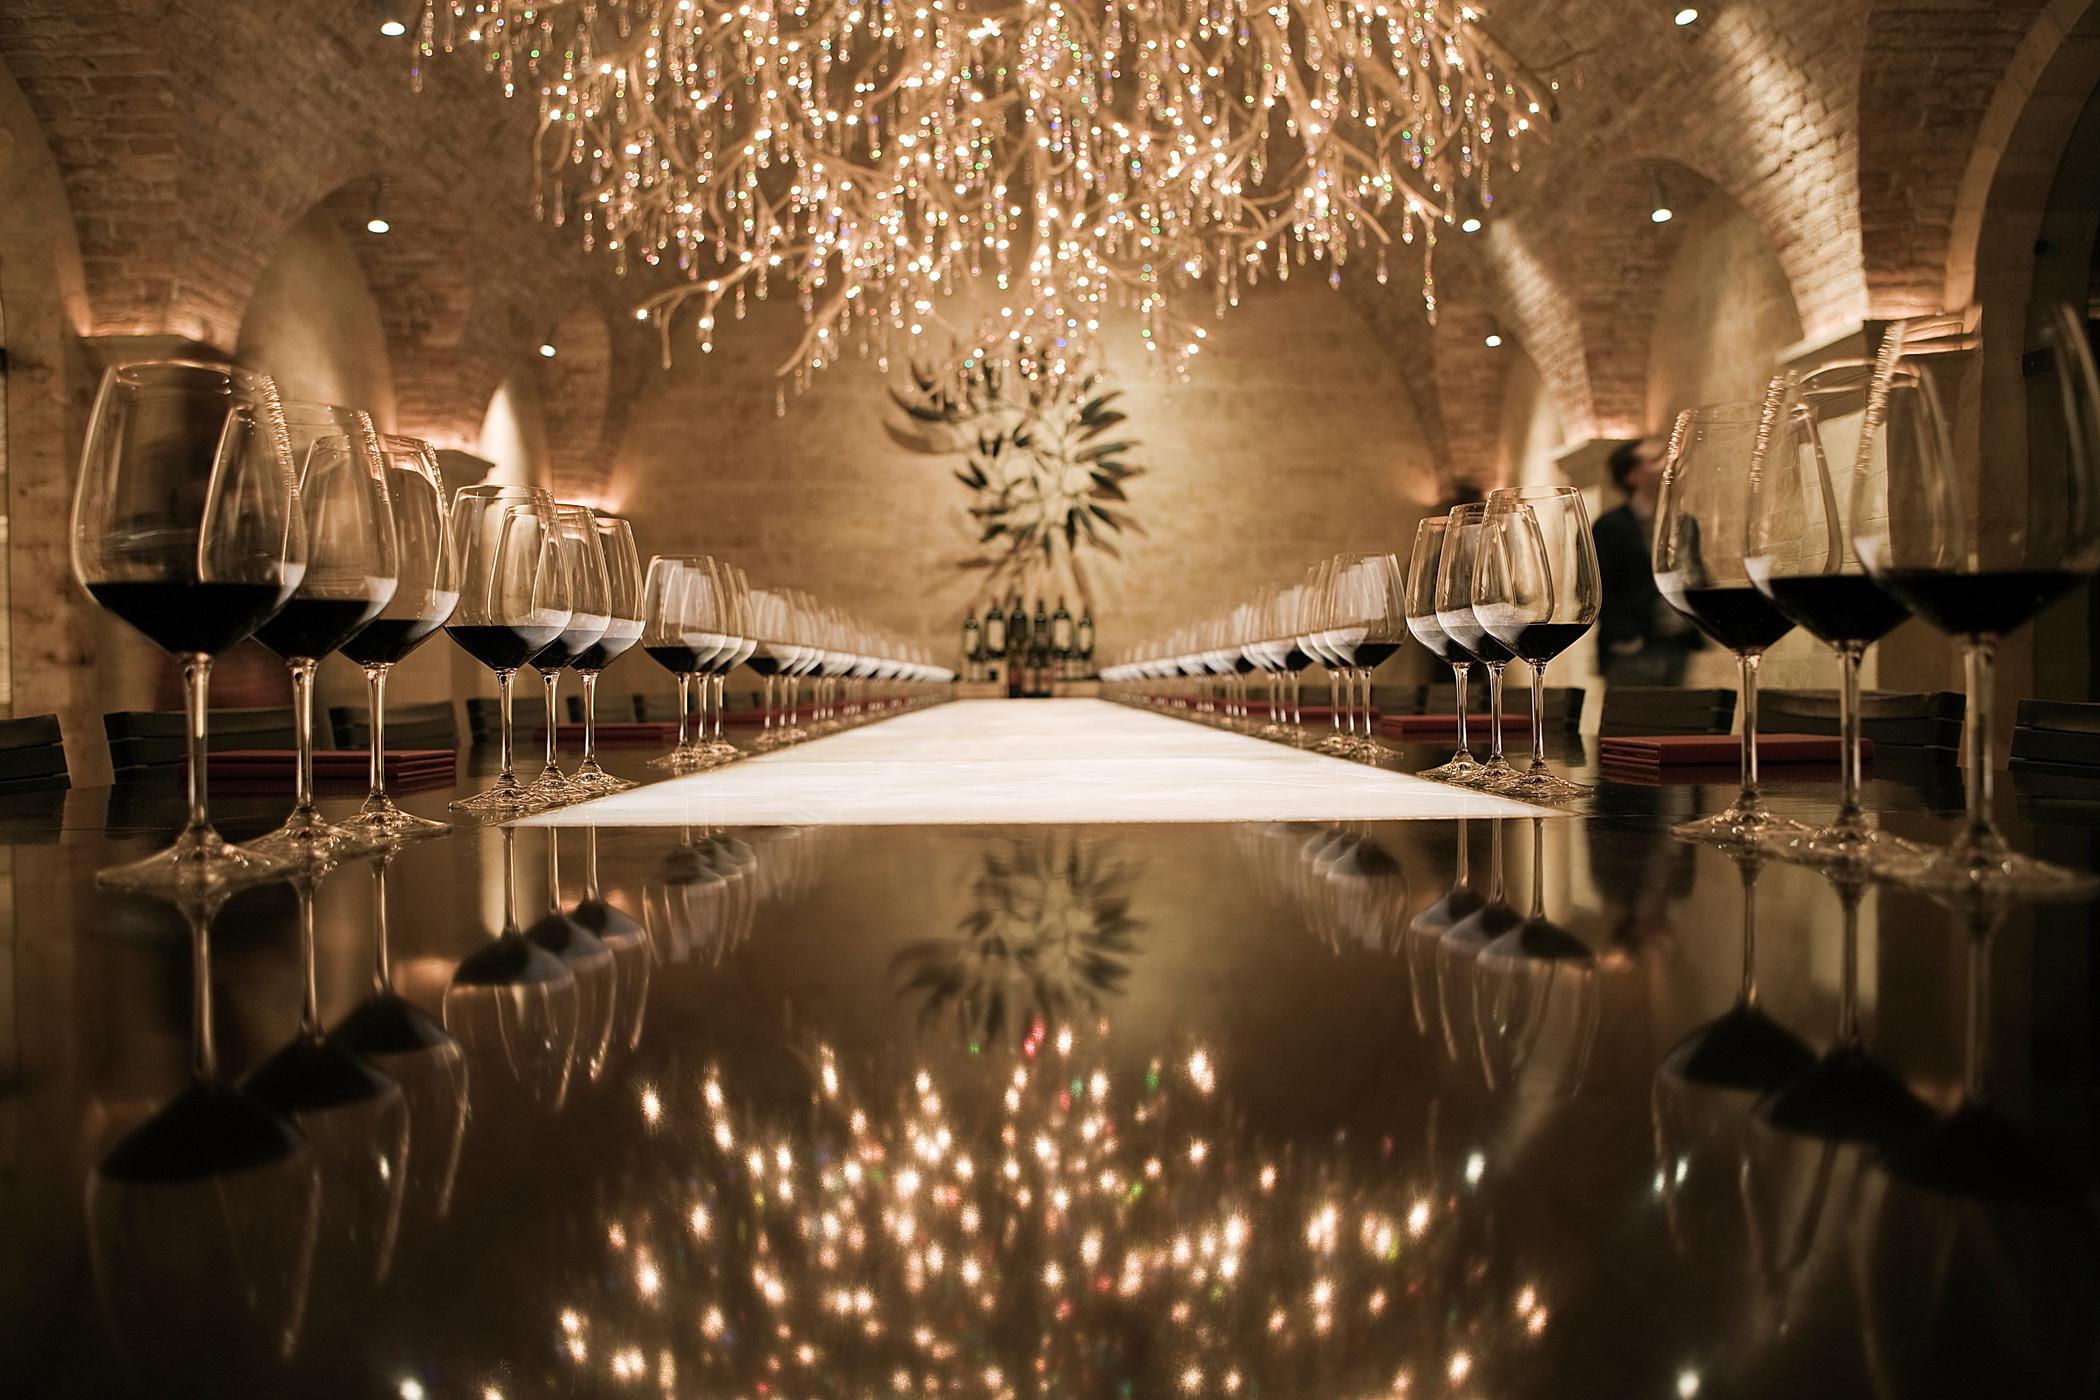 HALL Wines A Superb Private Event Venue